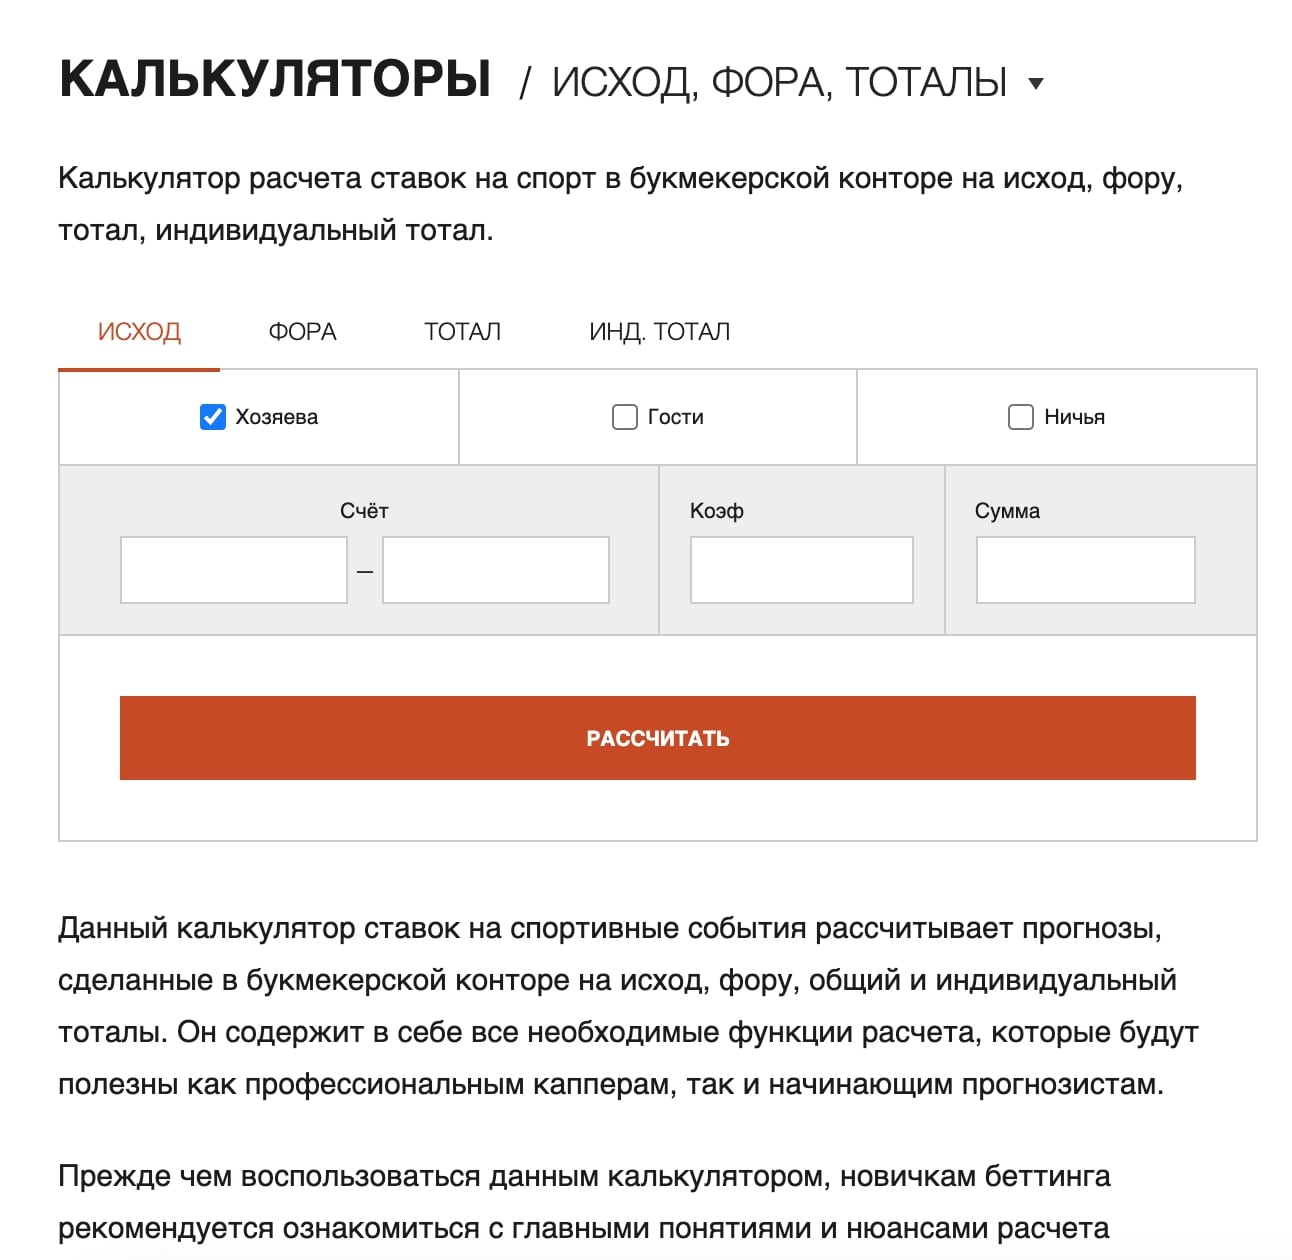 Калькулятор на сайте Alvin Almazov (Алвина Алмазова)